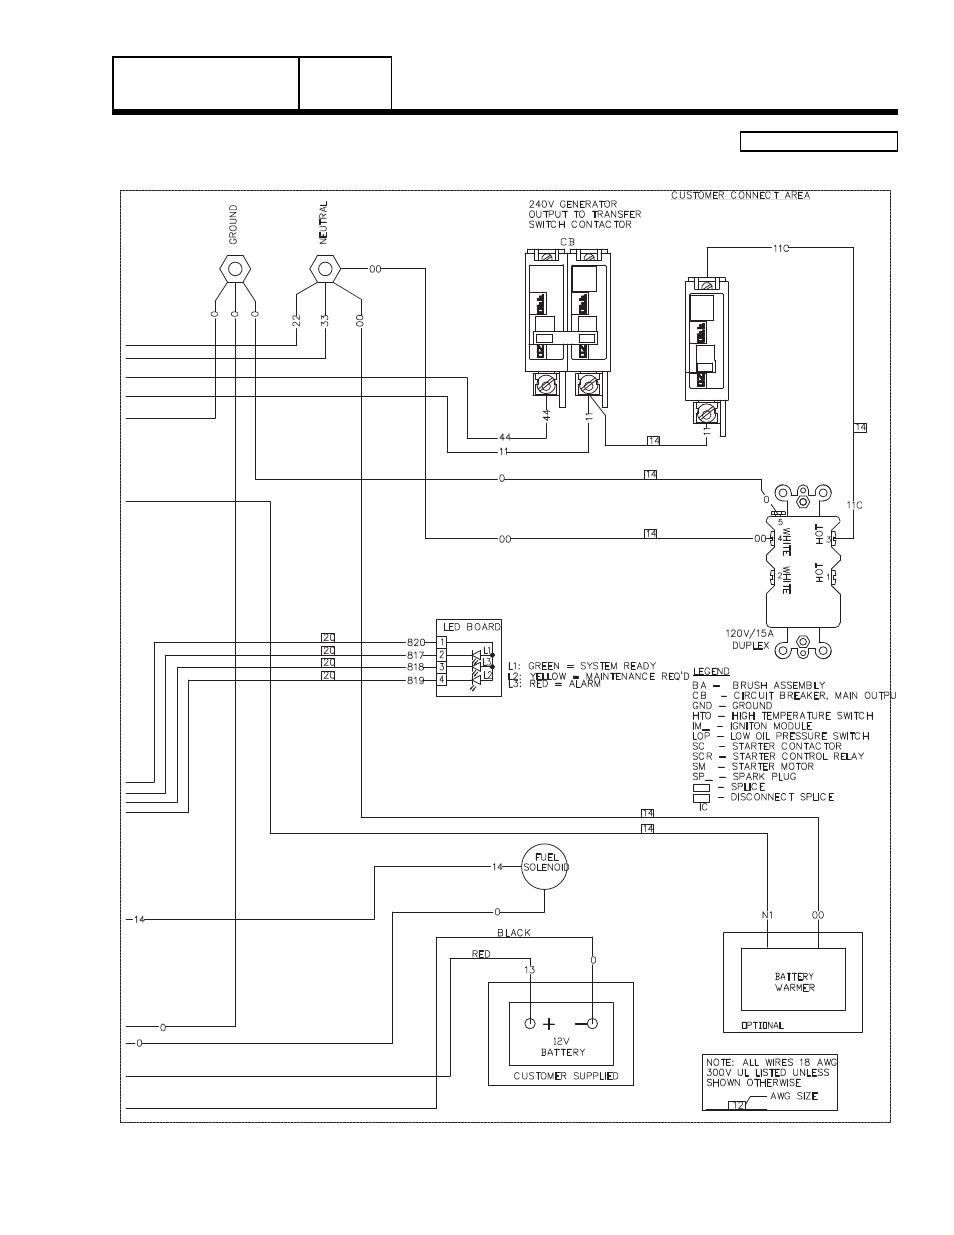 Diagram 8 Kw Generac Wiring Diagram Full Version Hd Quality Wiring Diagram Diagramsmaum Caditwergi It